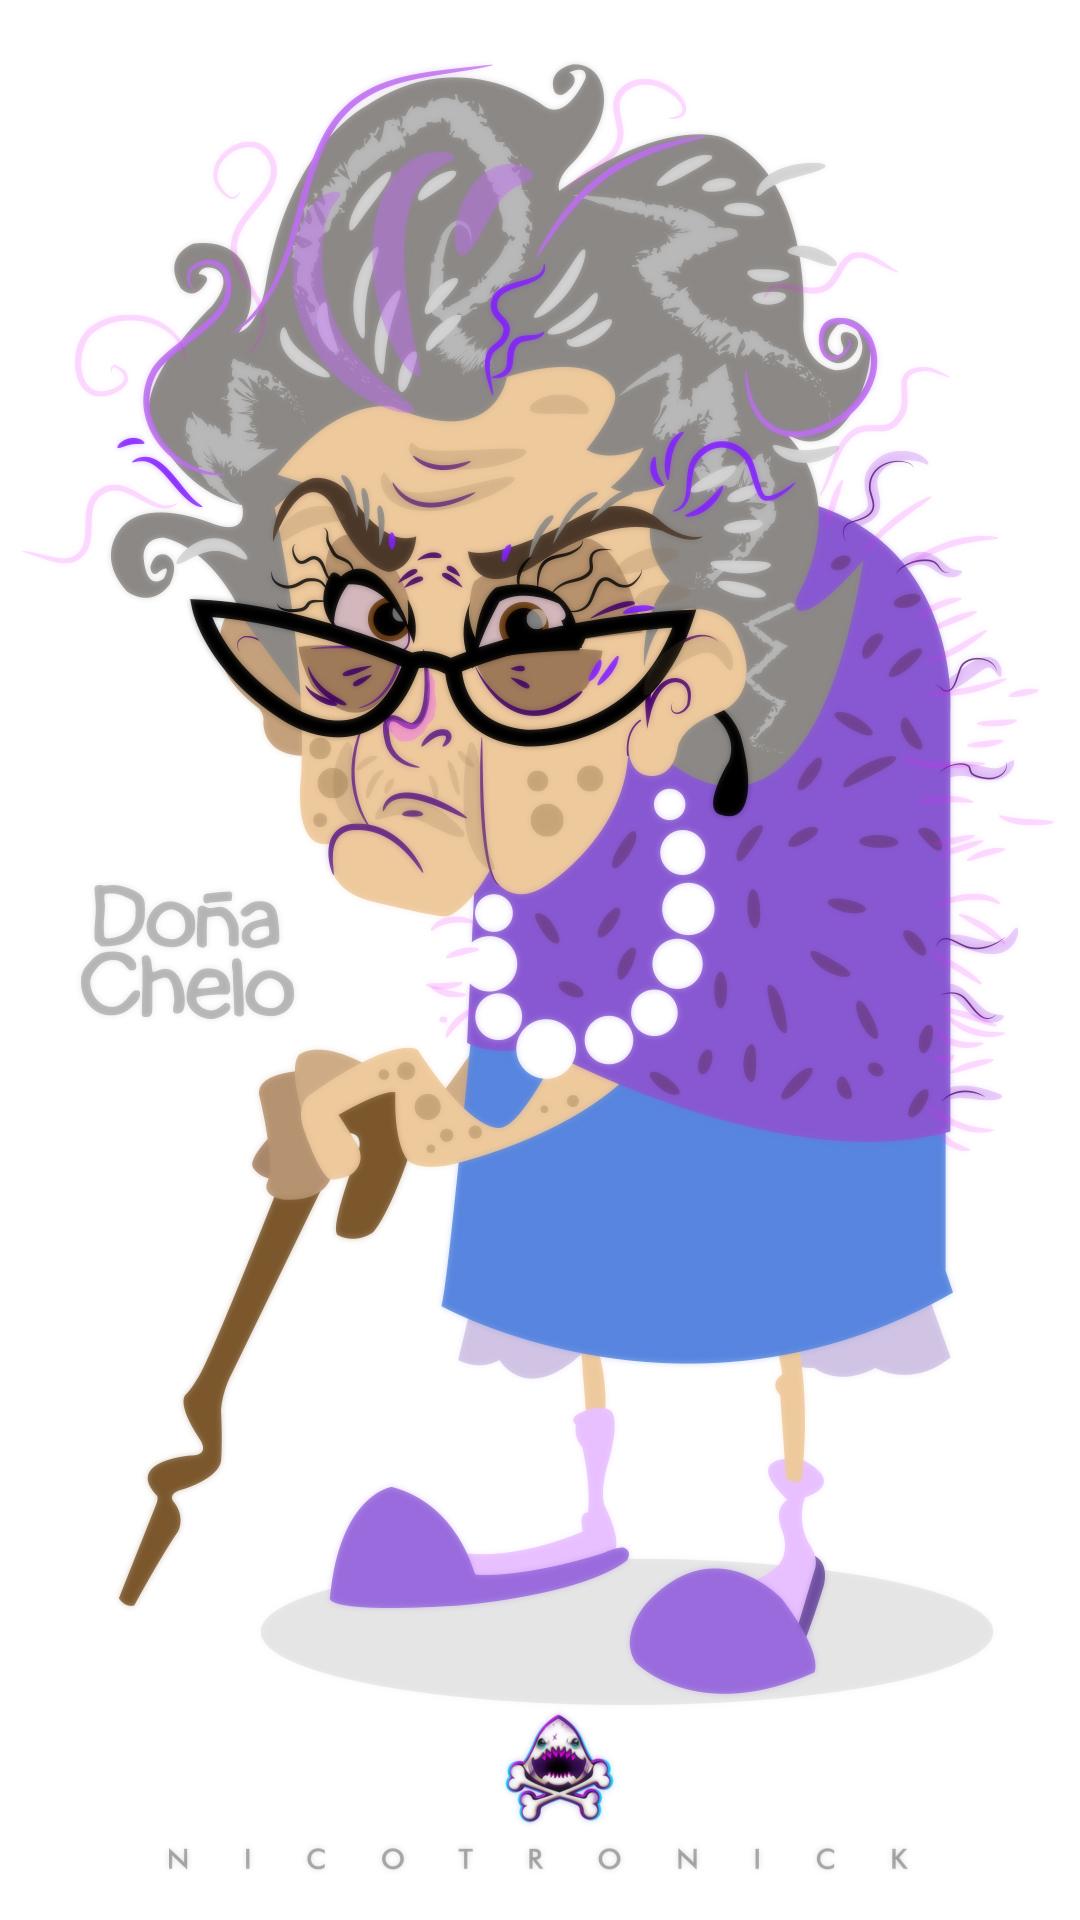 Dona Chelo Nicotronick by nicotronick